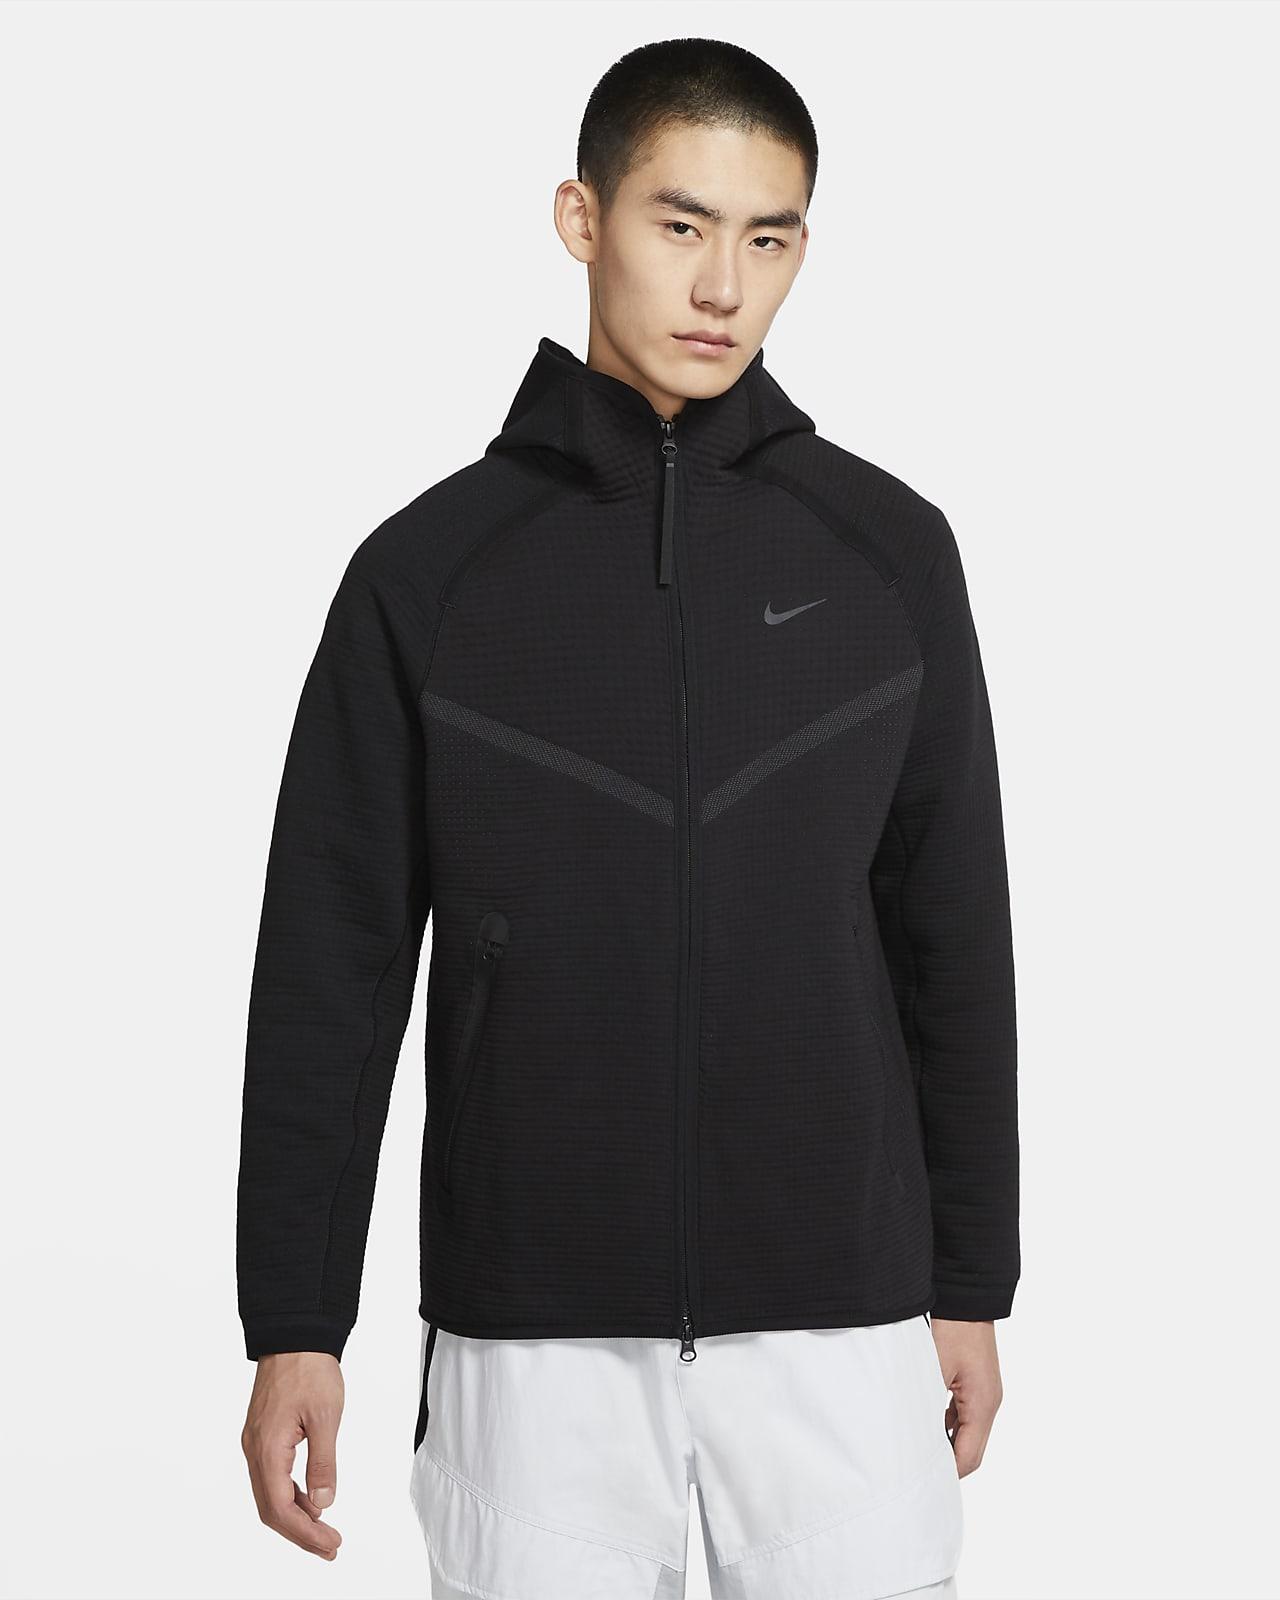 Nike Sportswear Tech Pack Windrunner 男子全长拉链开襟连帽衫